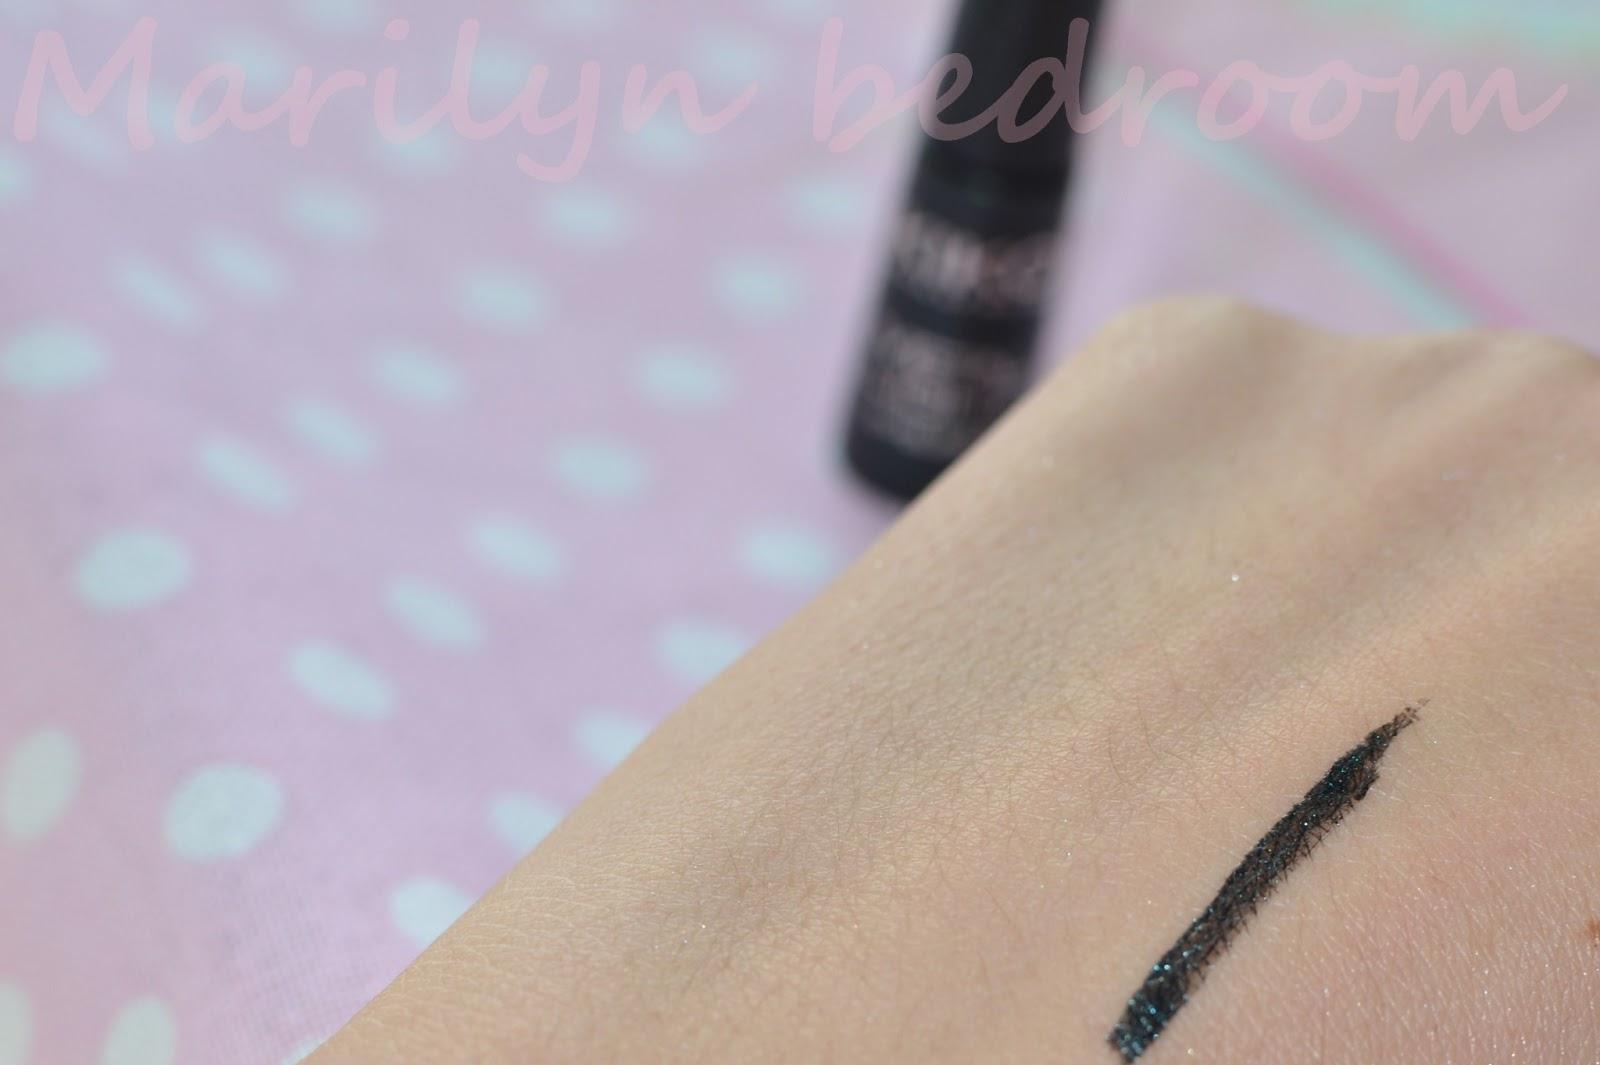 KIKO Cosmetics review - Marilyn